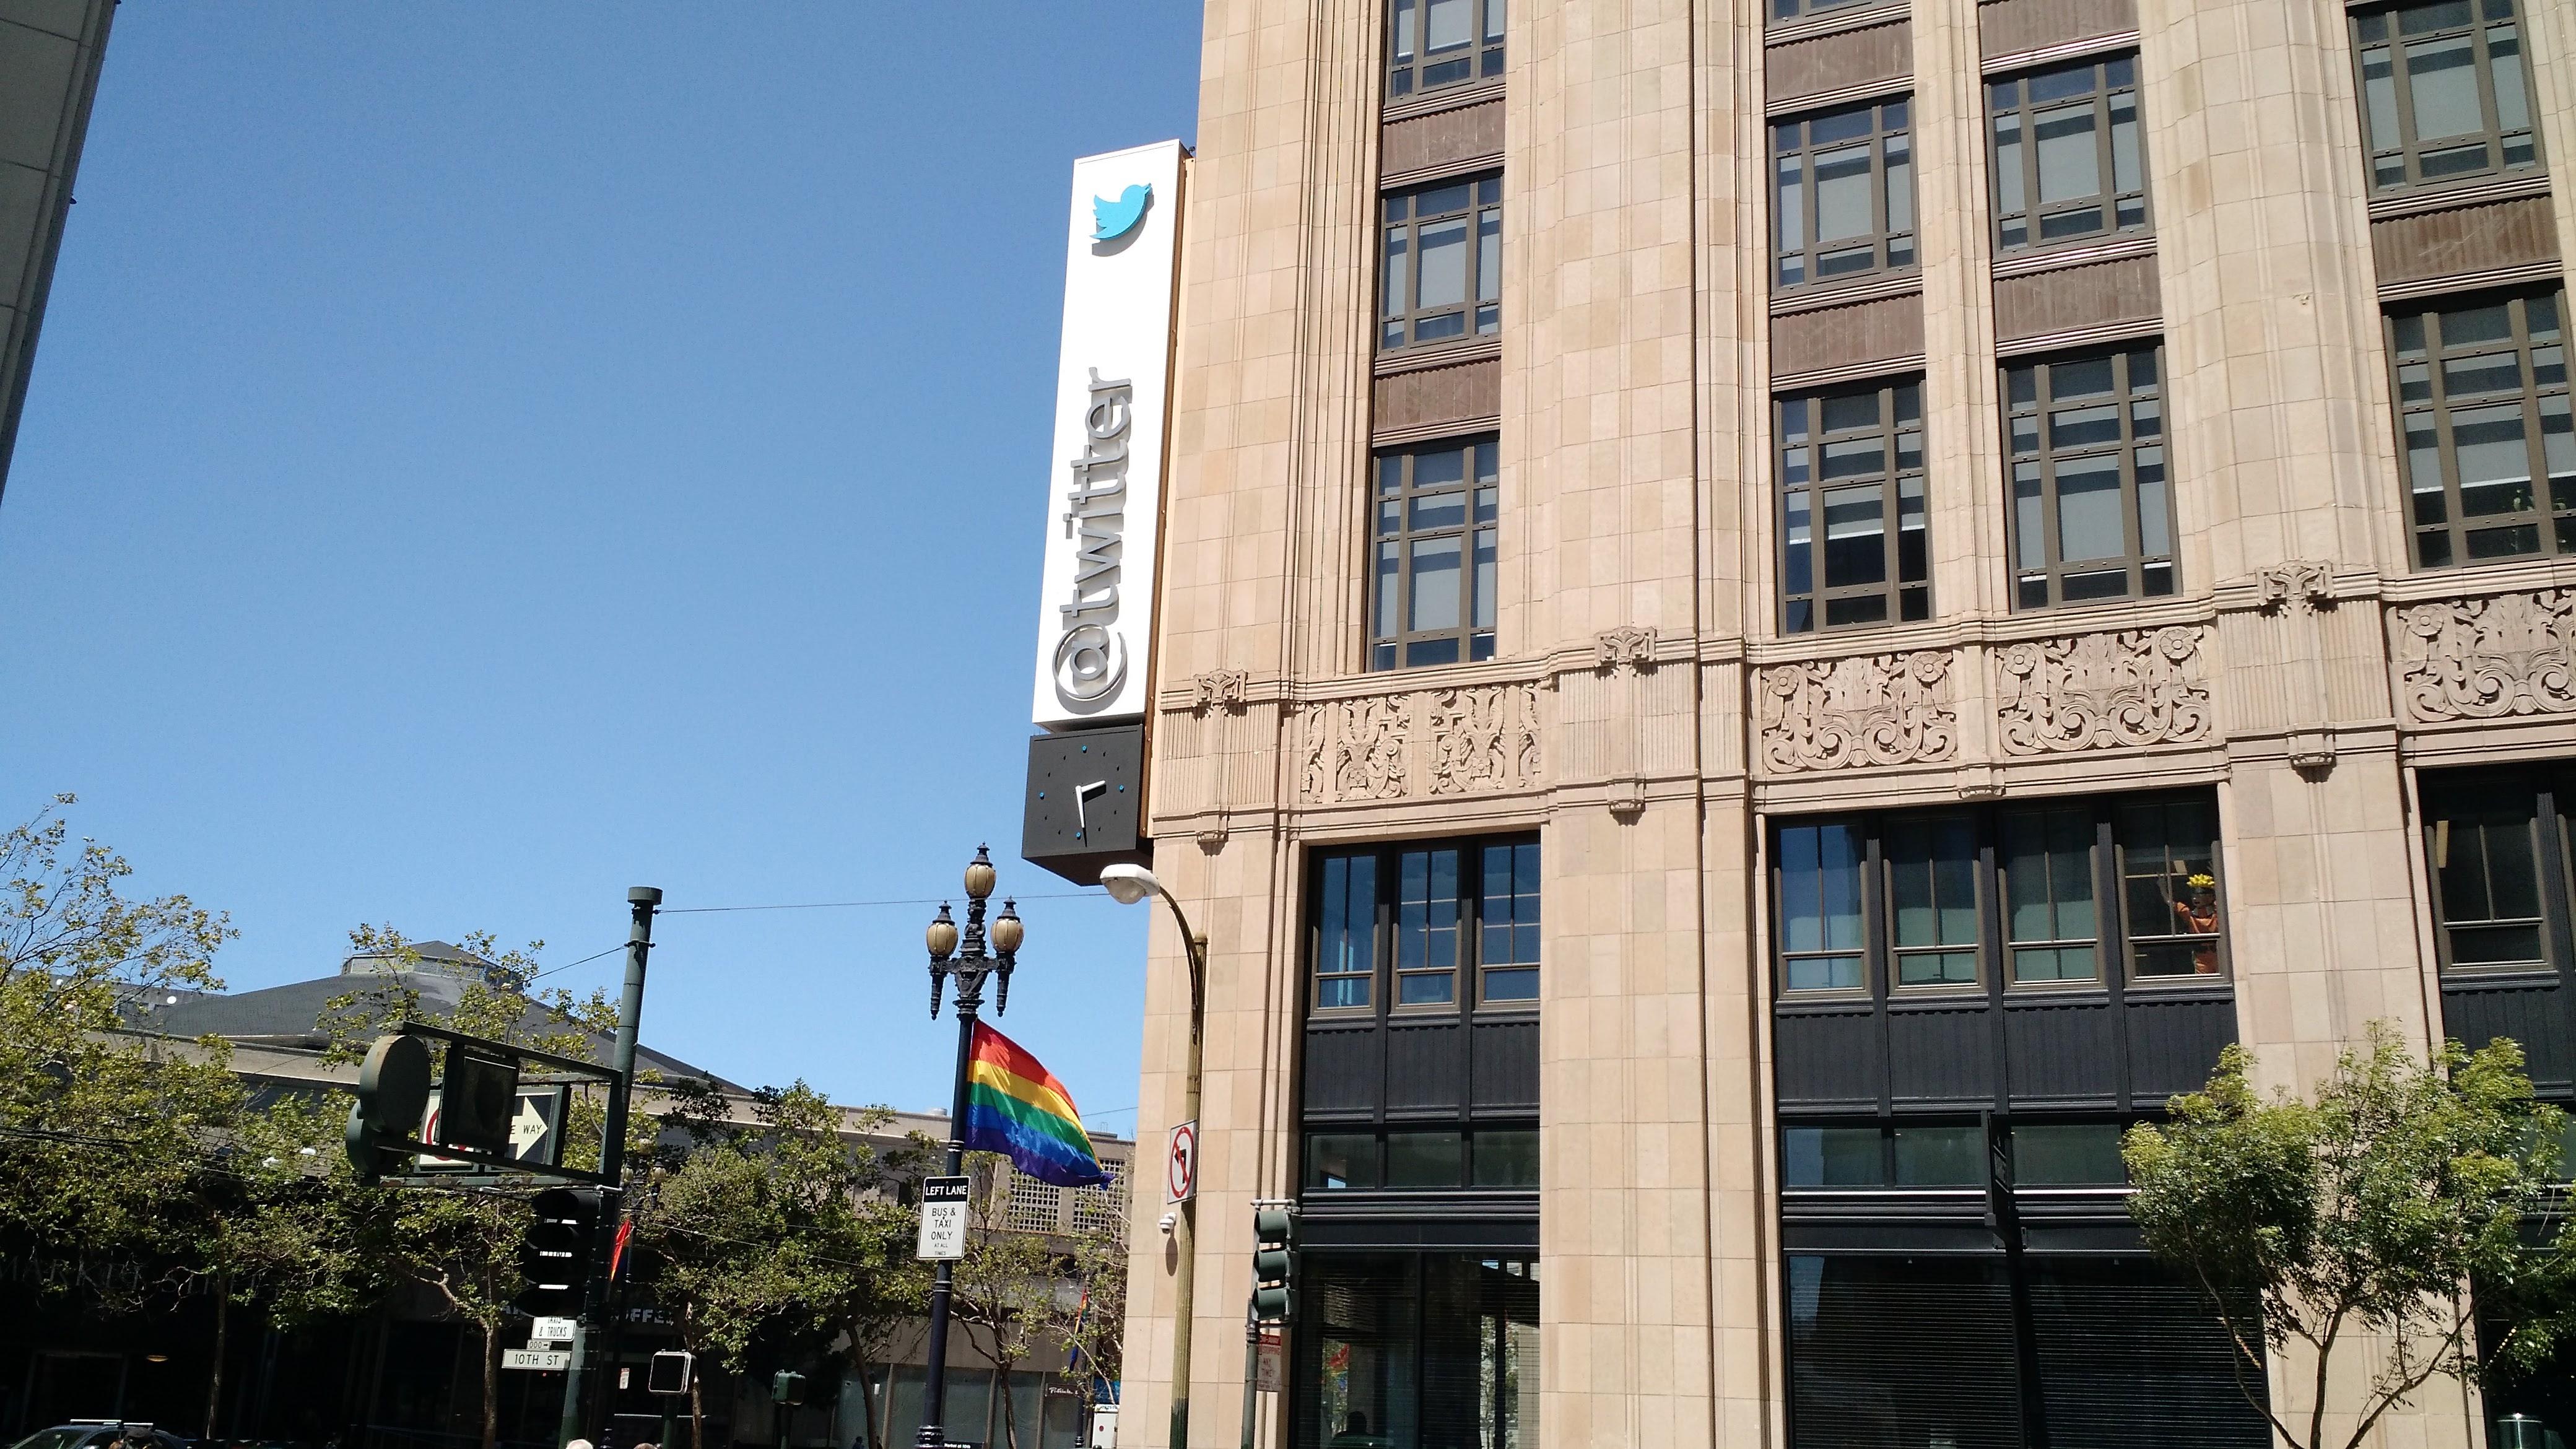 Twitter names ex-Google exec Omid Kordestani executive